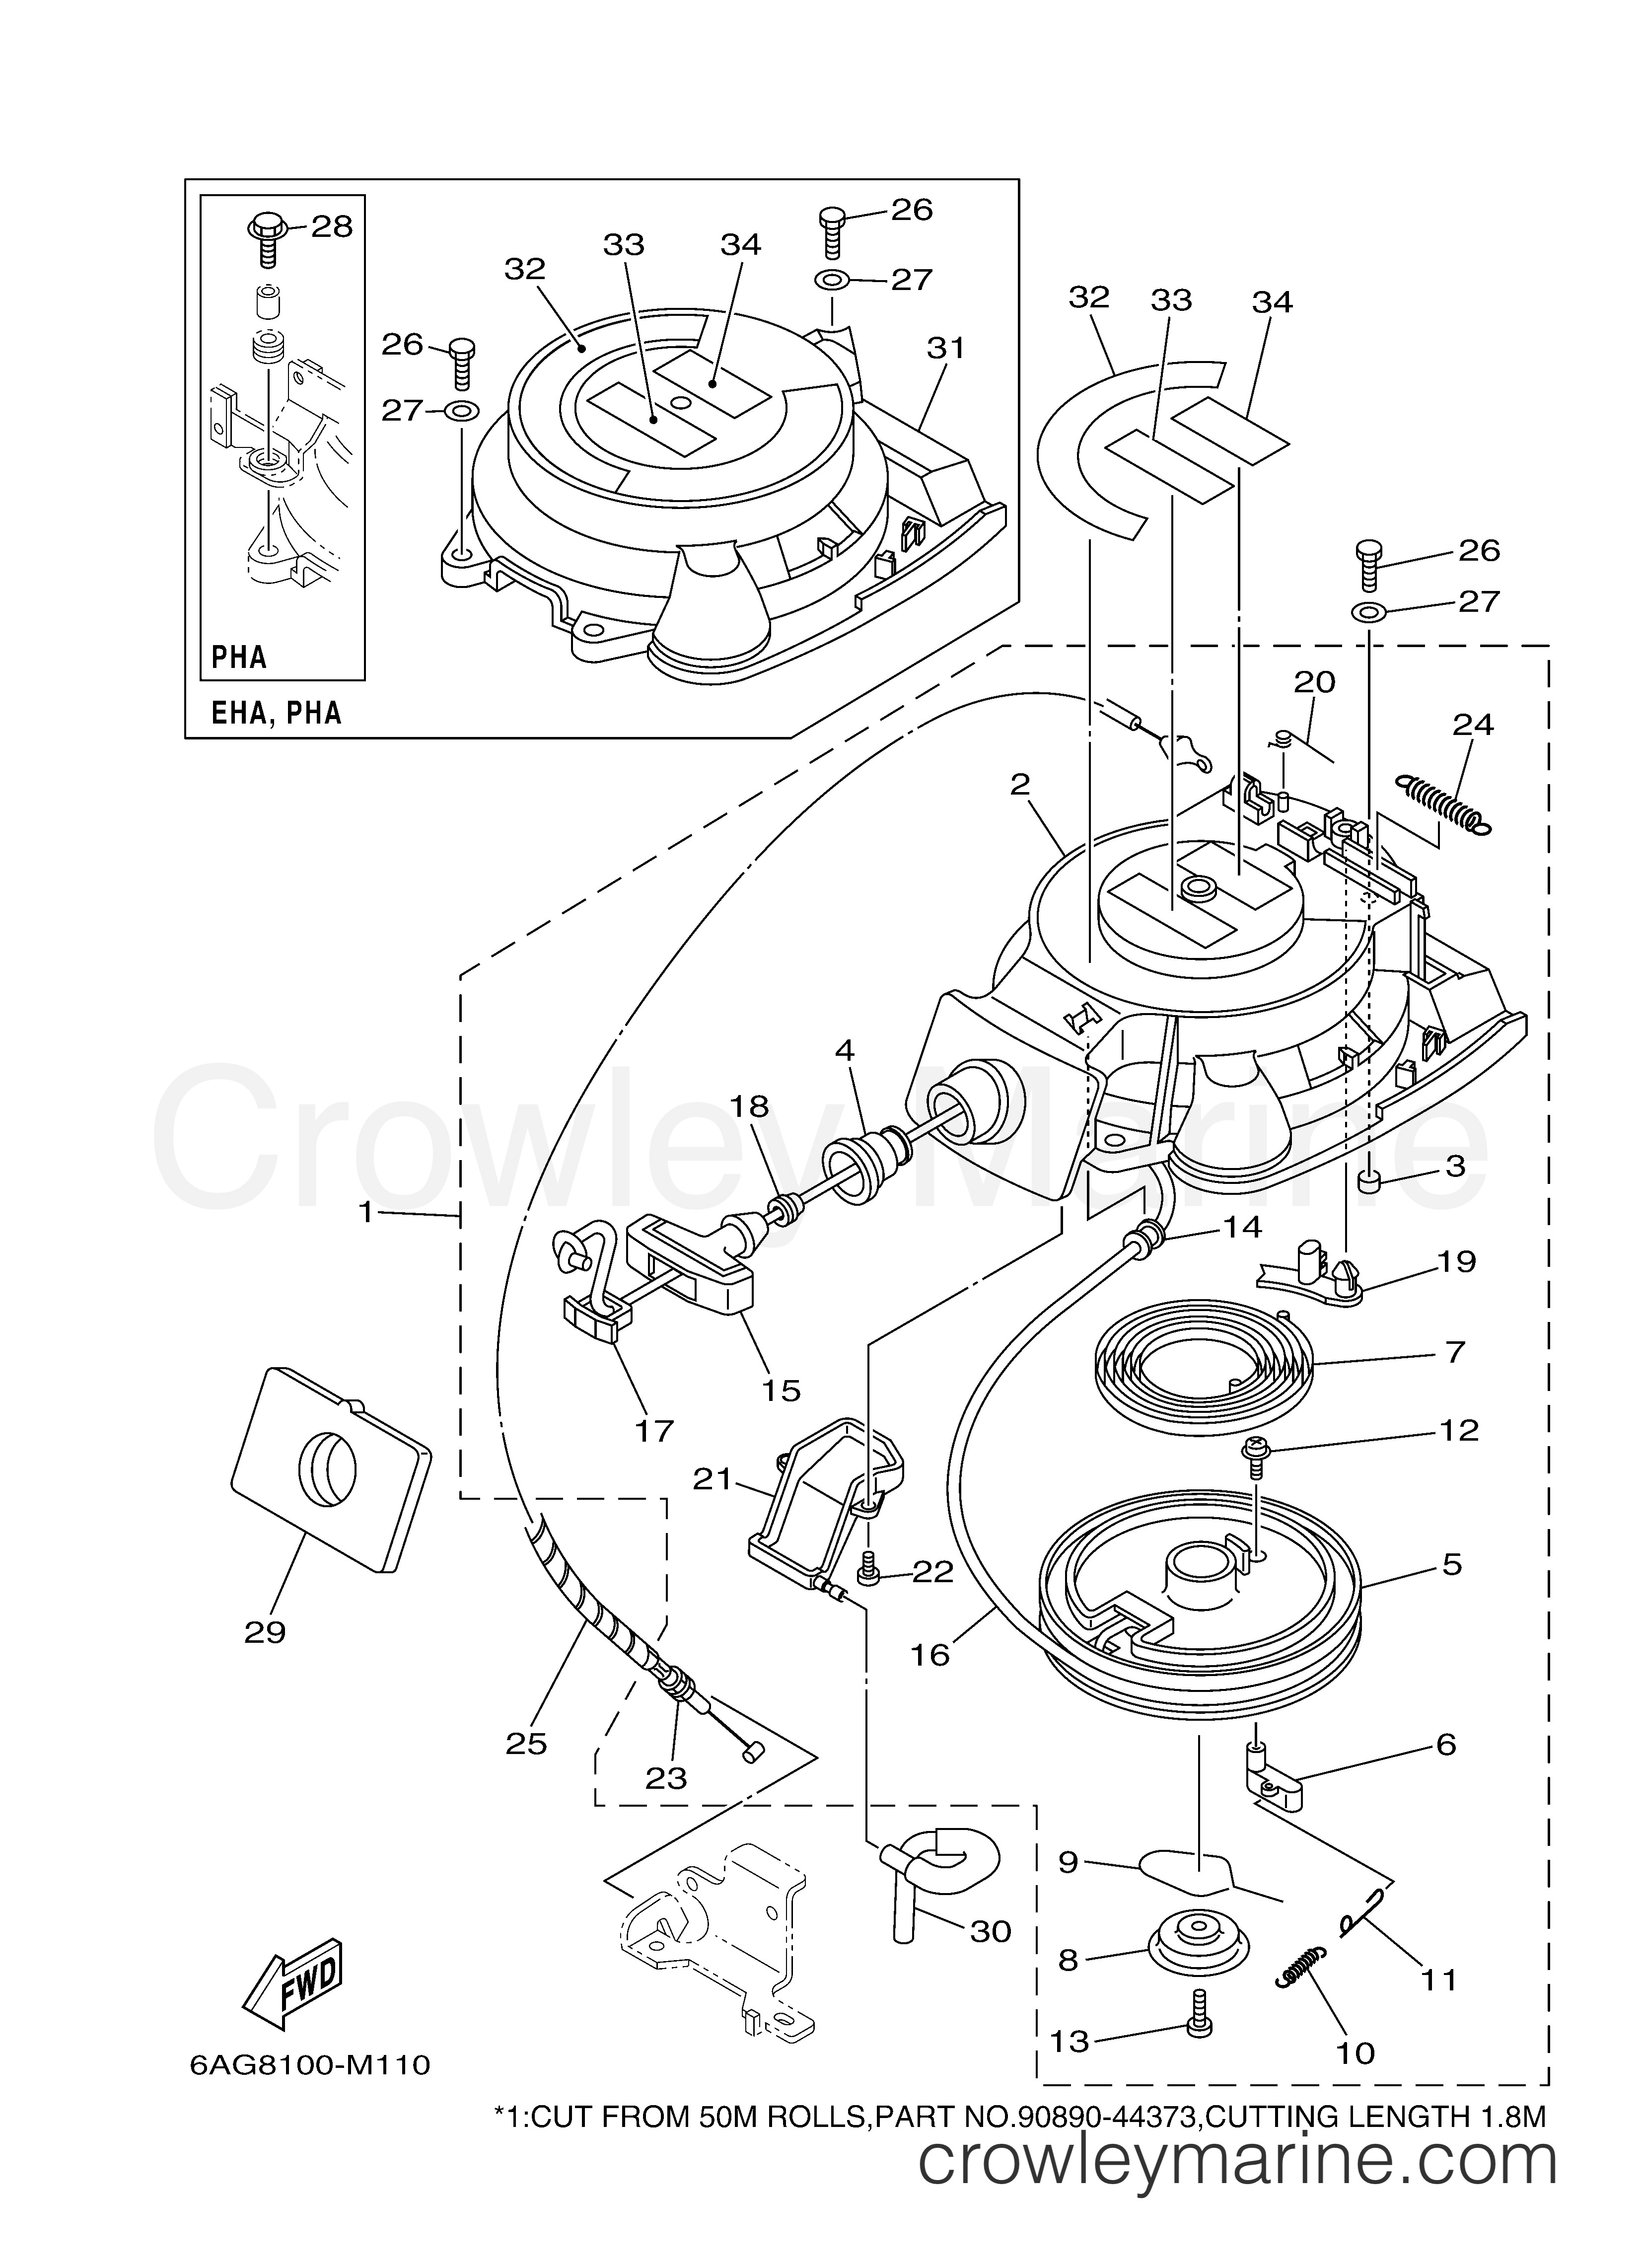 15 Hp Evinrude Parts Diagram Starter 2014 Yamaha Outboard 15hp F15smha Of 15 Hp Evinrude Parts Diagram